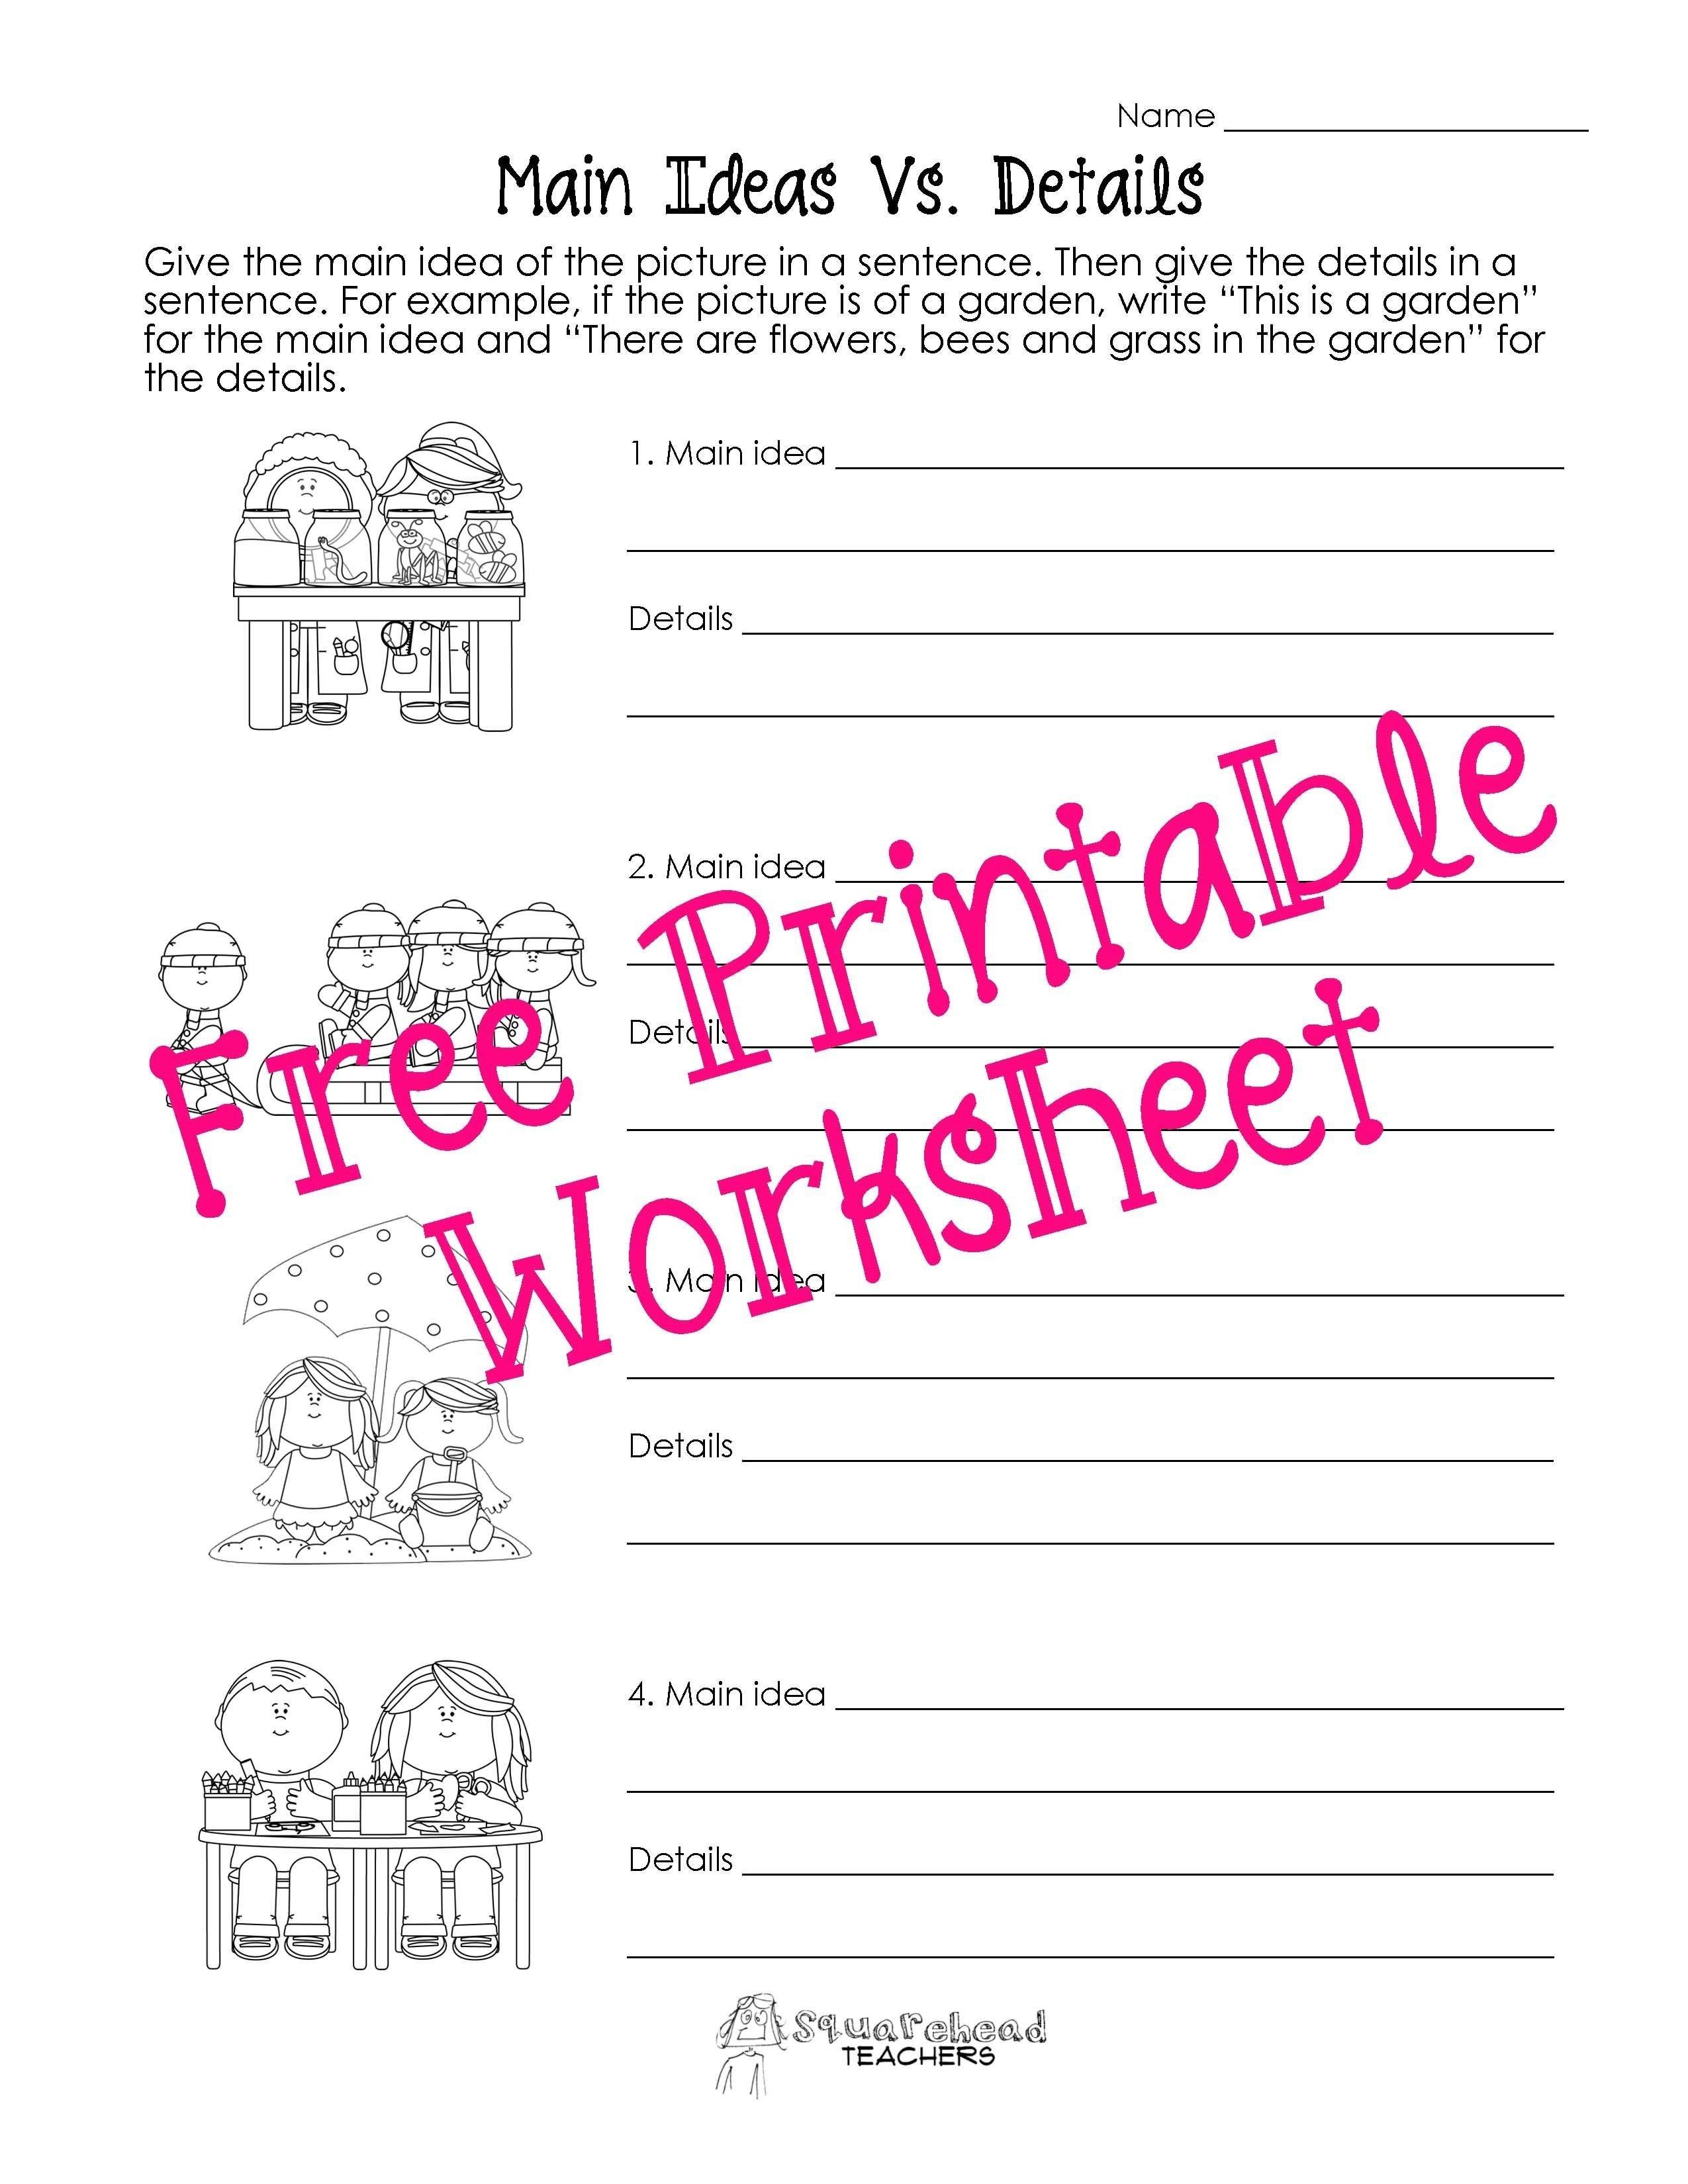 10 Attractive Main Idea And Details Worksheets 3Rd Grade squarehead teachers main idea vs details worksheets genius 1 2021